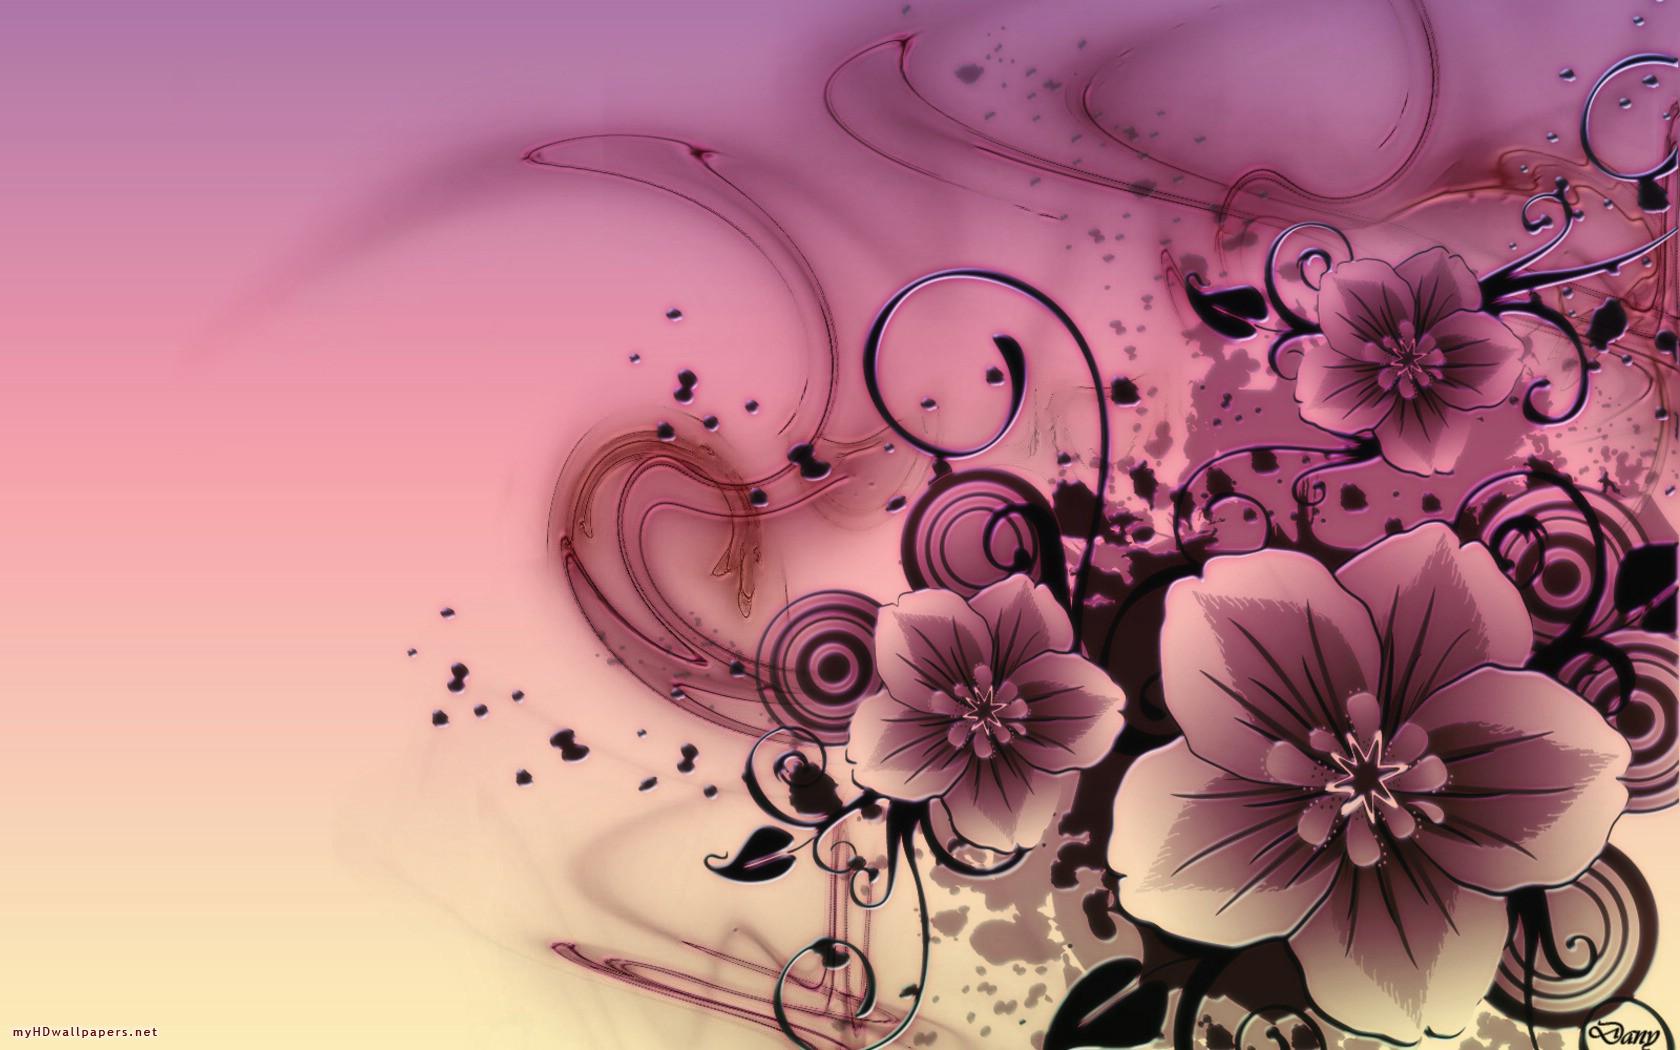 Abtract Flower Wallpaper Hd Desktop Wallpaper Gallery 1680x1050